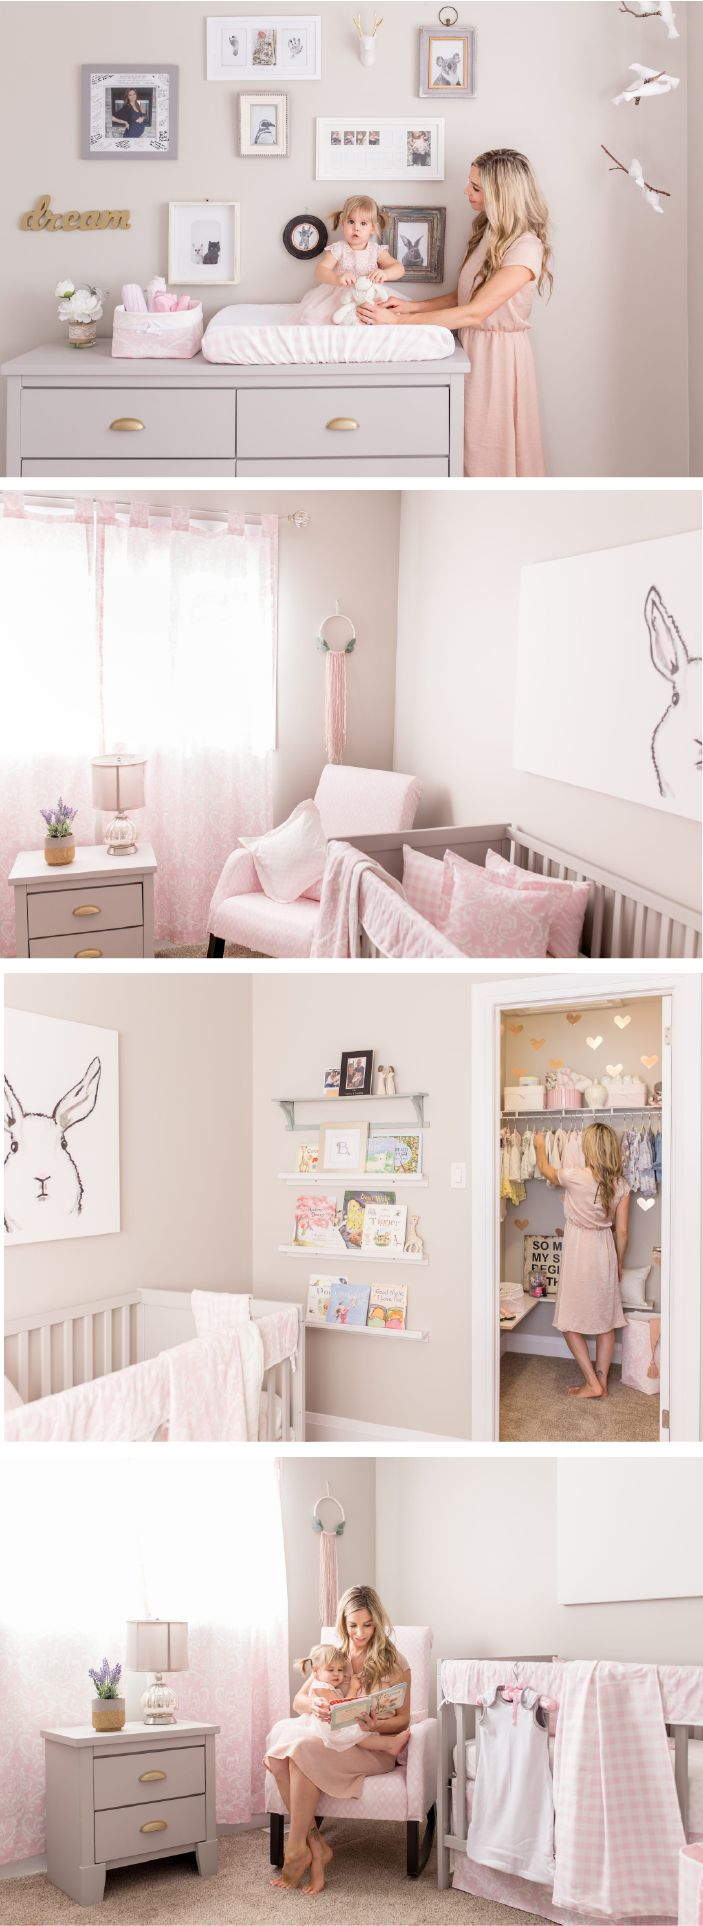 Brielle's Nursery Reveal – nursery